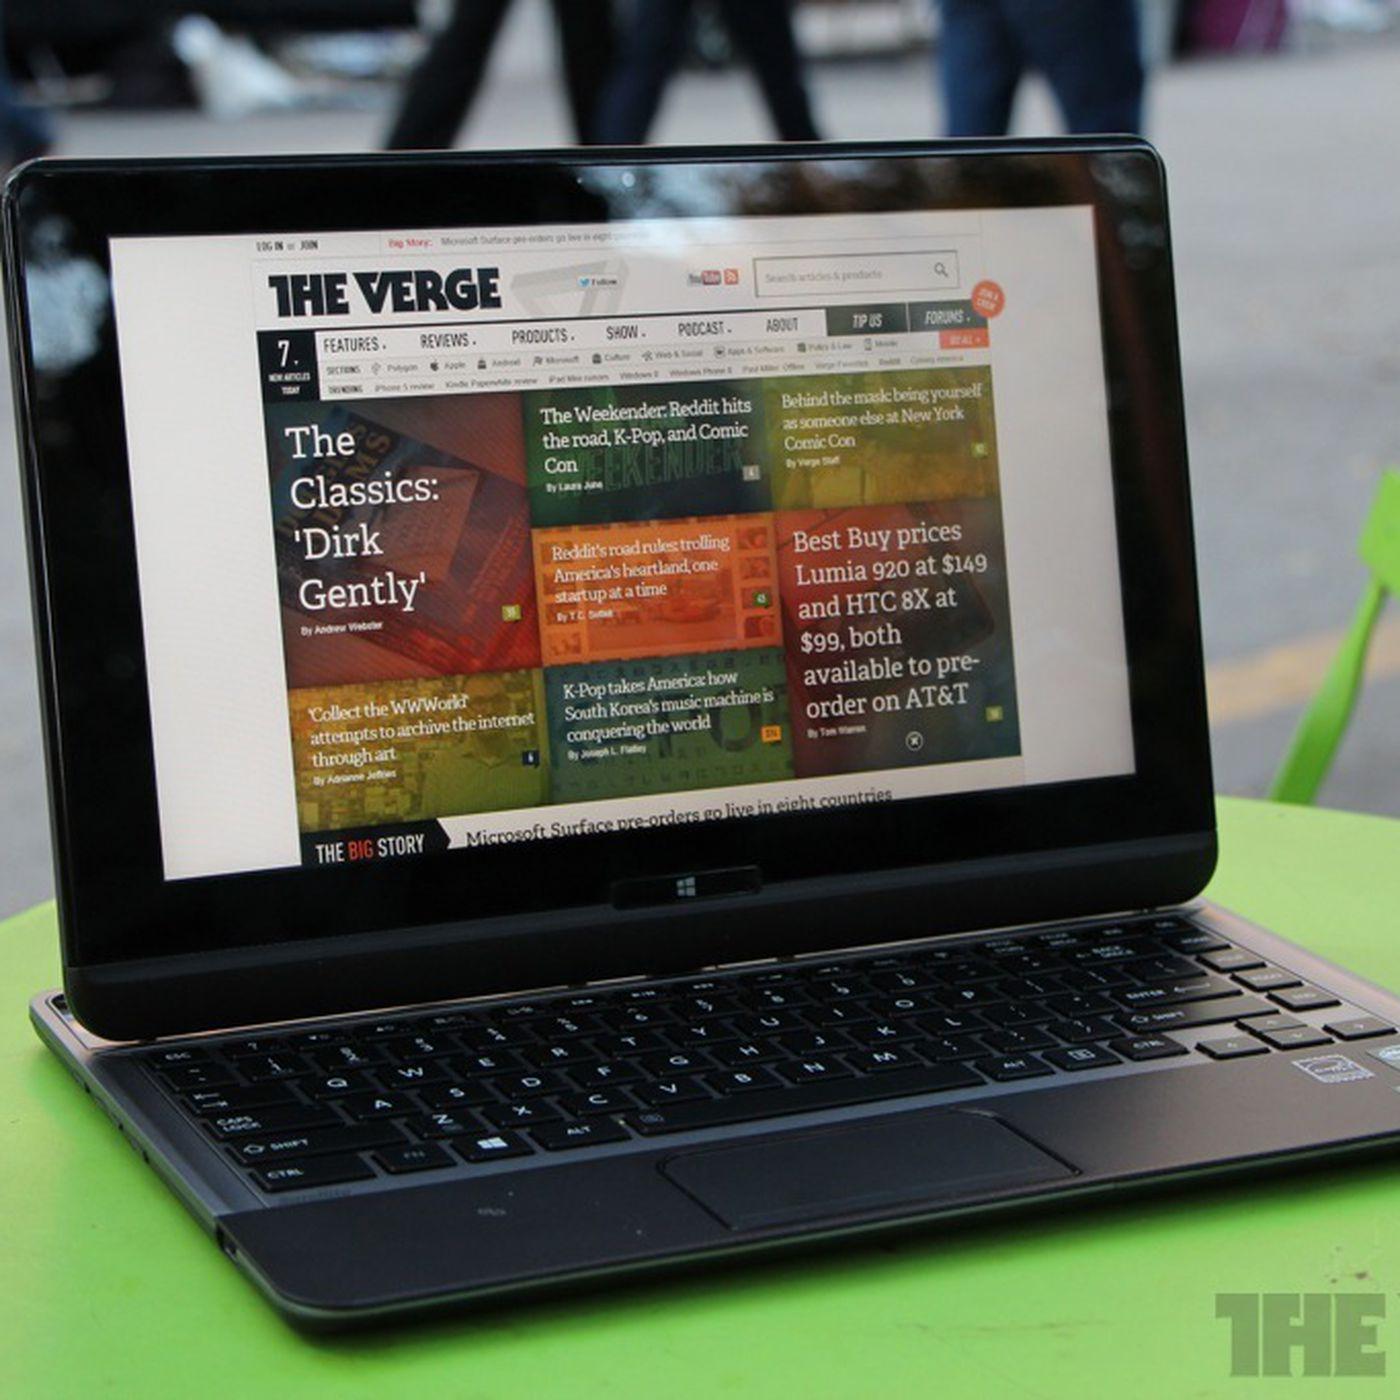 Toshiba Satellite U925t review - The Verge